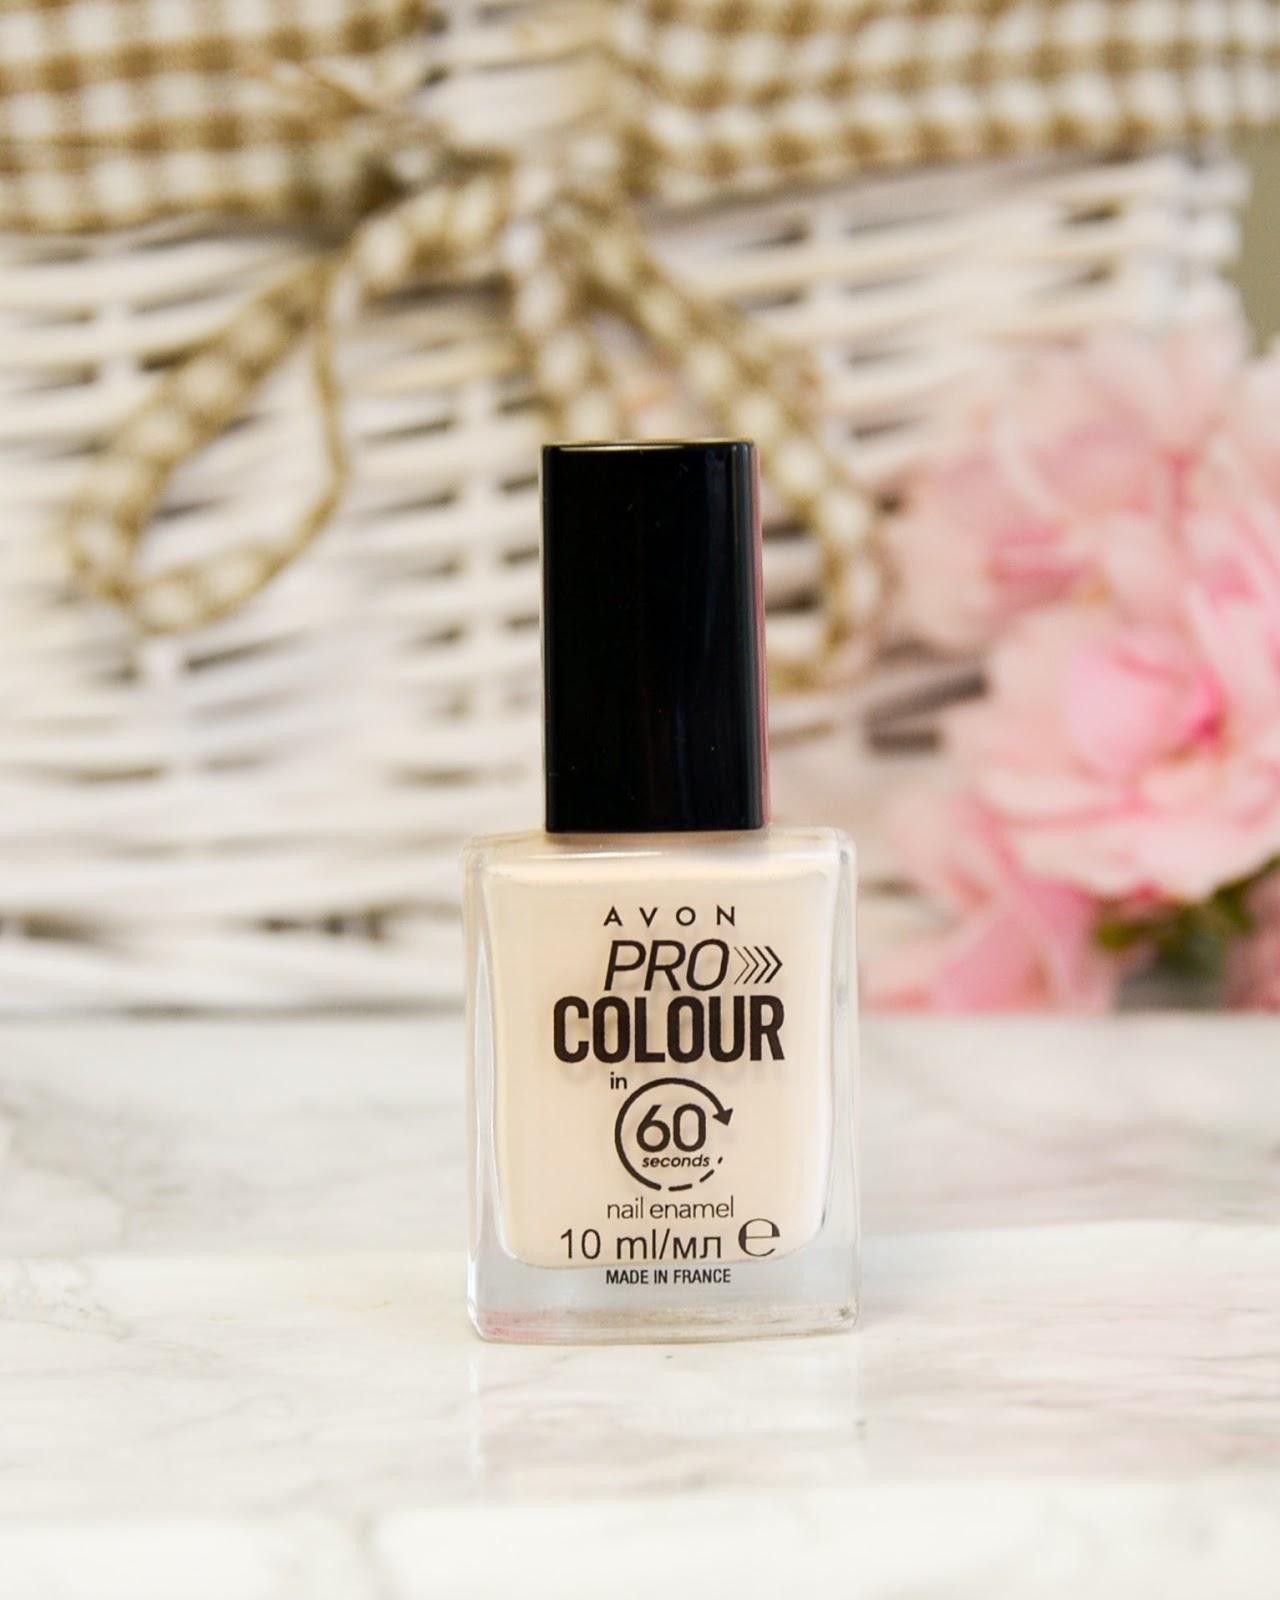 Avon Pro Colour in 60 Seconds Nail Enamel Chop-Chop Cream